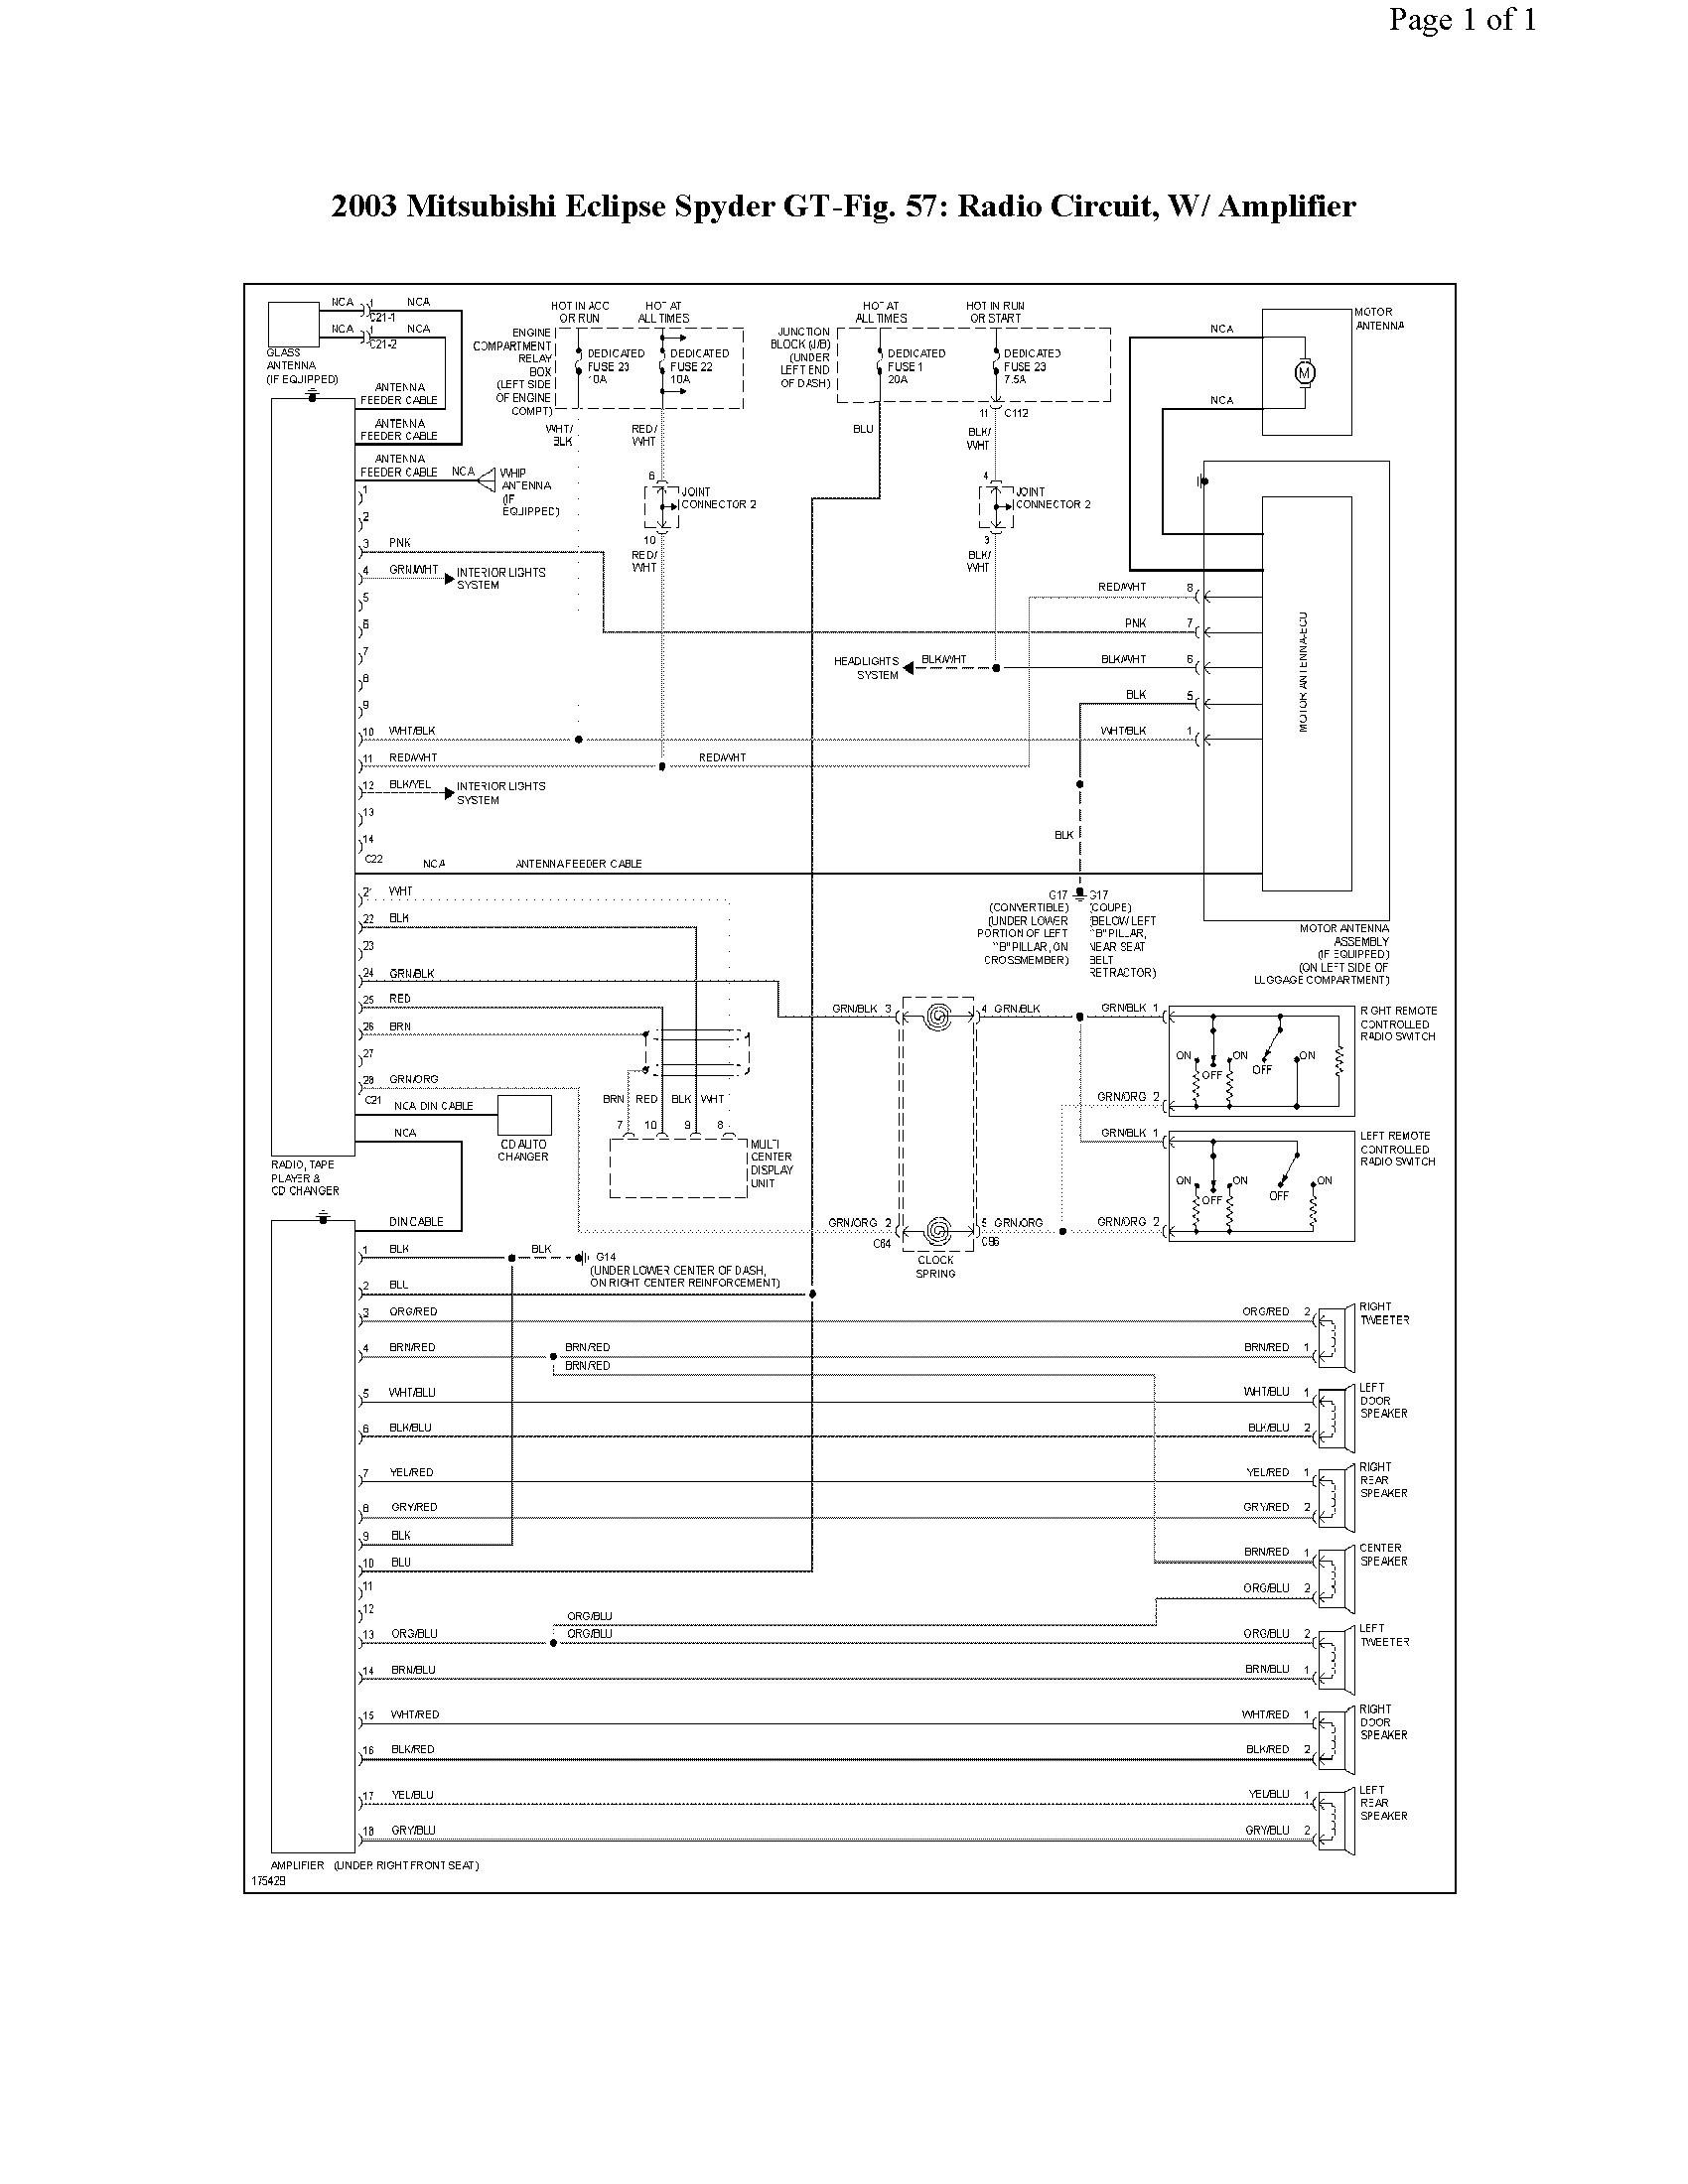 2002 Mitsubishi Galant Engine Diagram Mitsubishi Eclipse Engine Diagram Of 2002 Mitsubishi Galant Engine Diagram